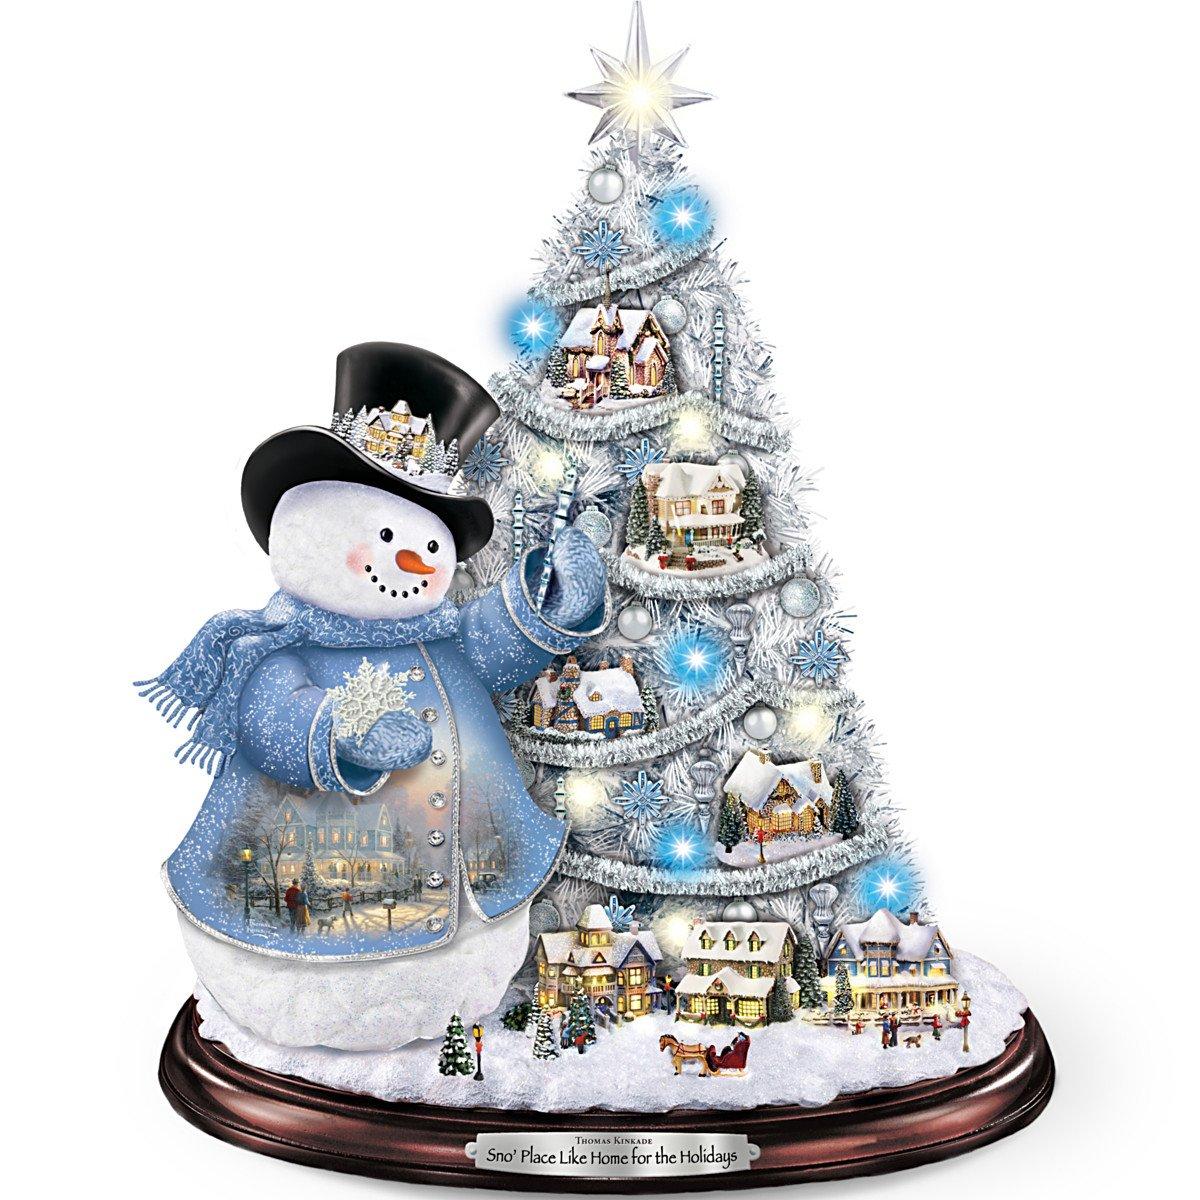 Kinkade christmas ornaments - Amazon Com Thomas Kinkade Snowman Pre Lit Christmas Tree Sno Place Like Home For The Holidays By The Bradford Exchange Home Kitchen